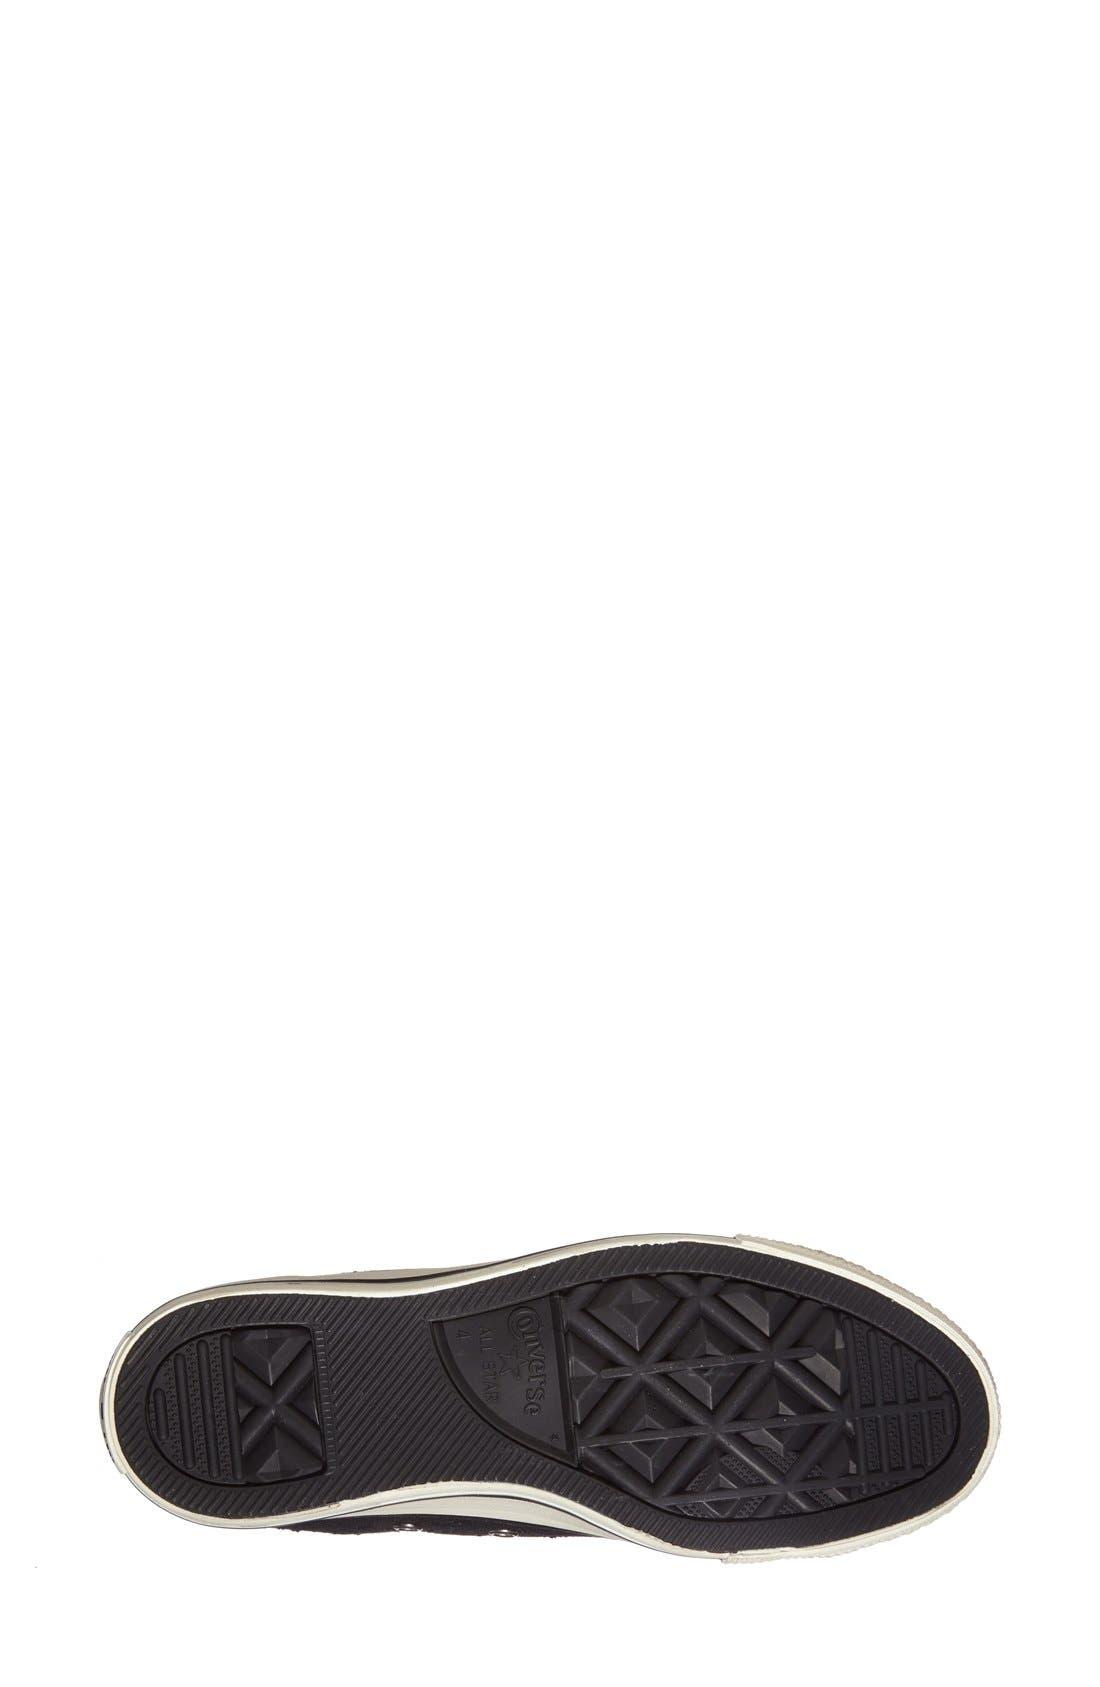 Alternate Image 4  - Converse Chuck Taylor® All Star® 'Star Hardware' High Top Sneaker (Women)